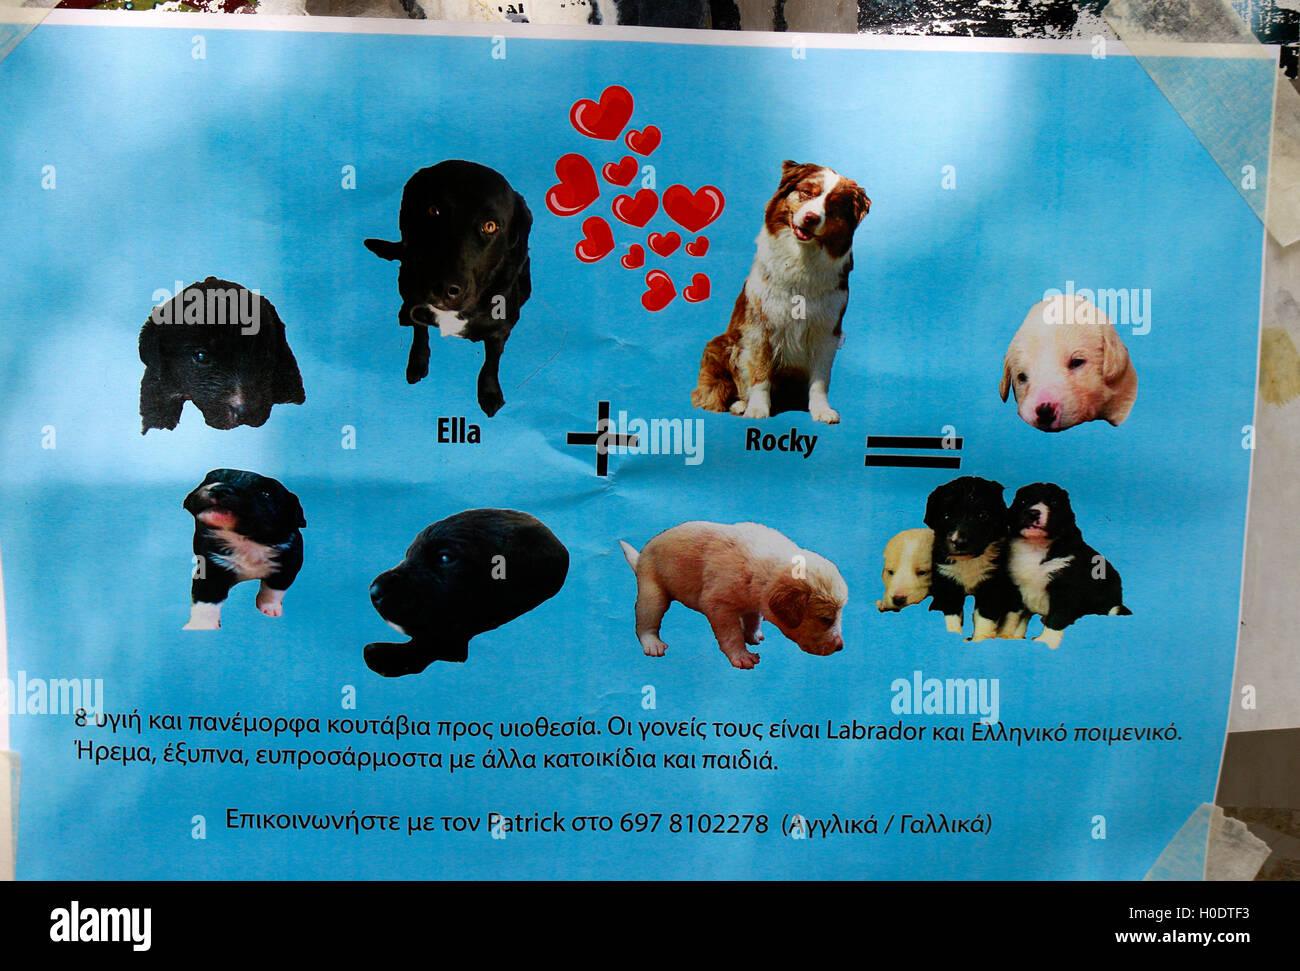 lustiges Inserat fuer Hundewelpen, 5. April 2016, Athen, Griechenland. - Stock Image